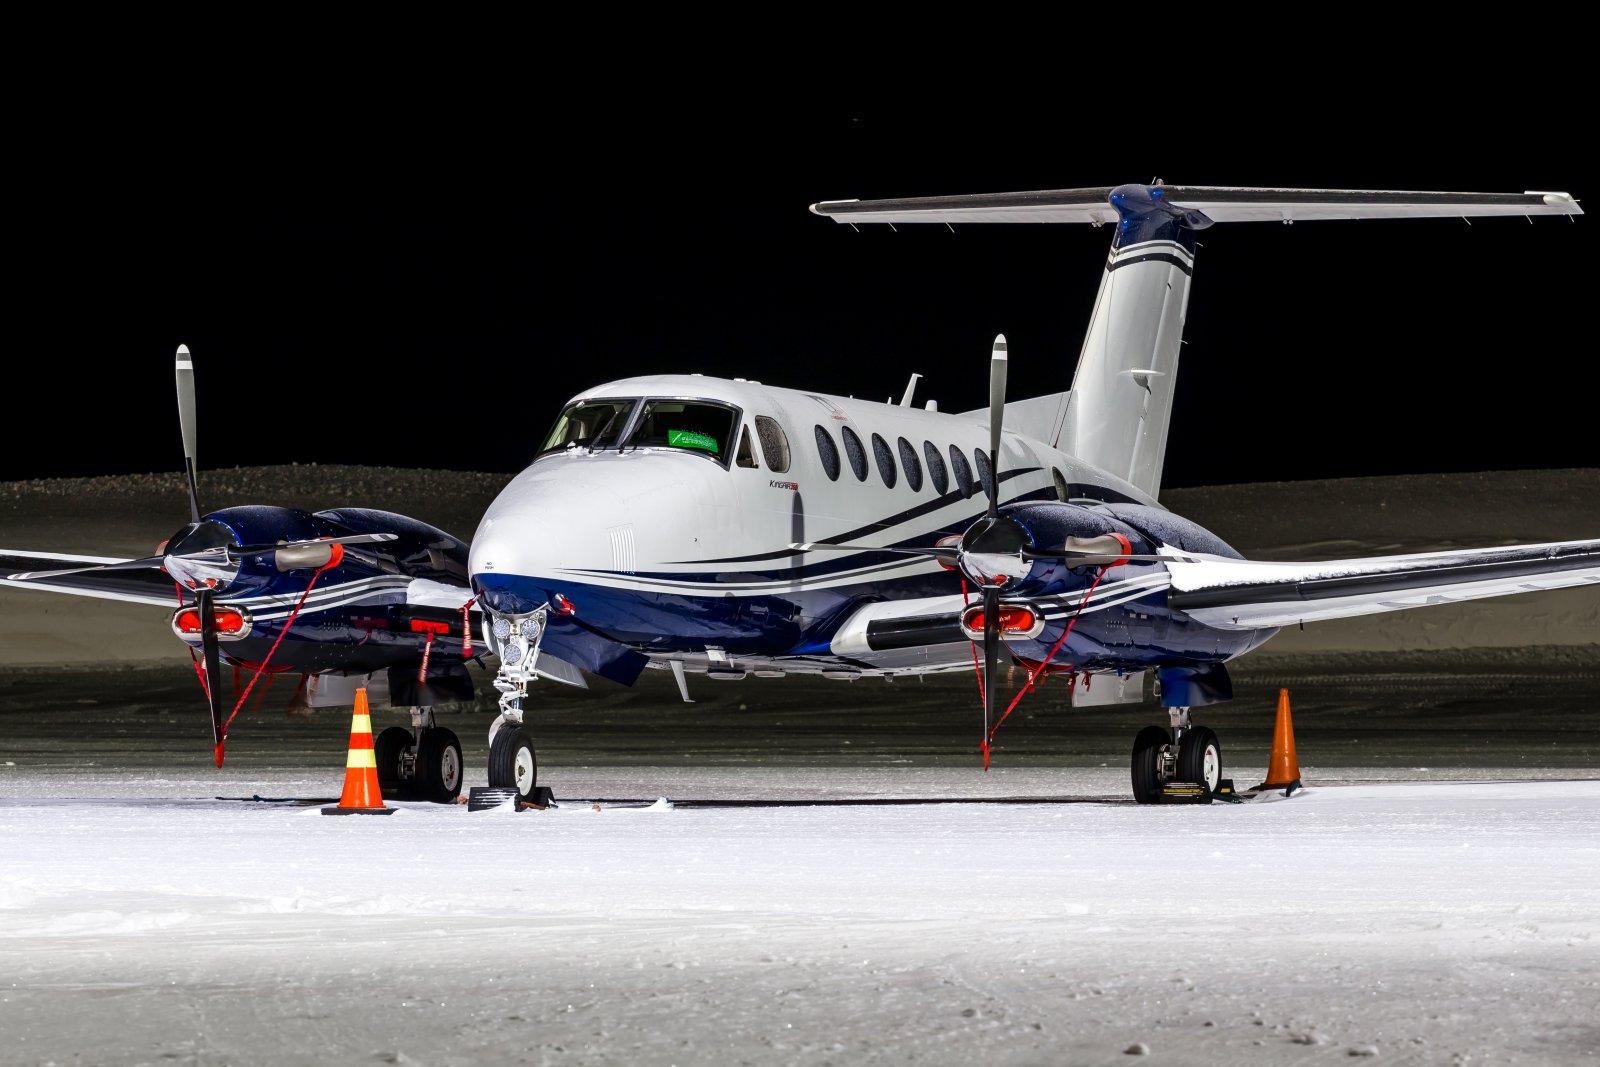 25.2. Beechcraft B300 King Air 350